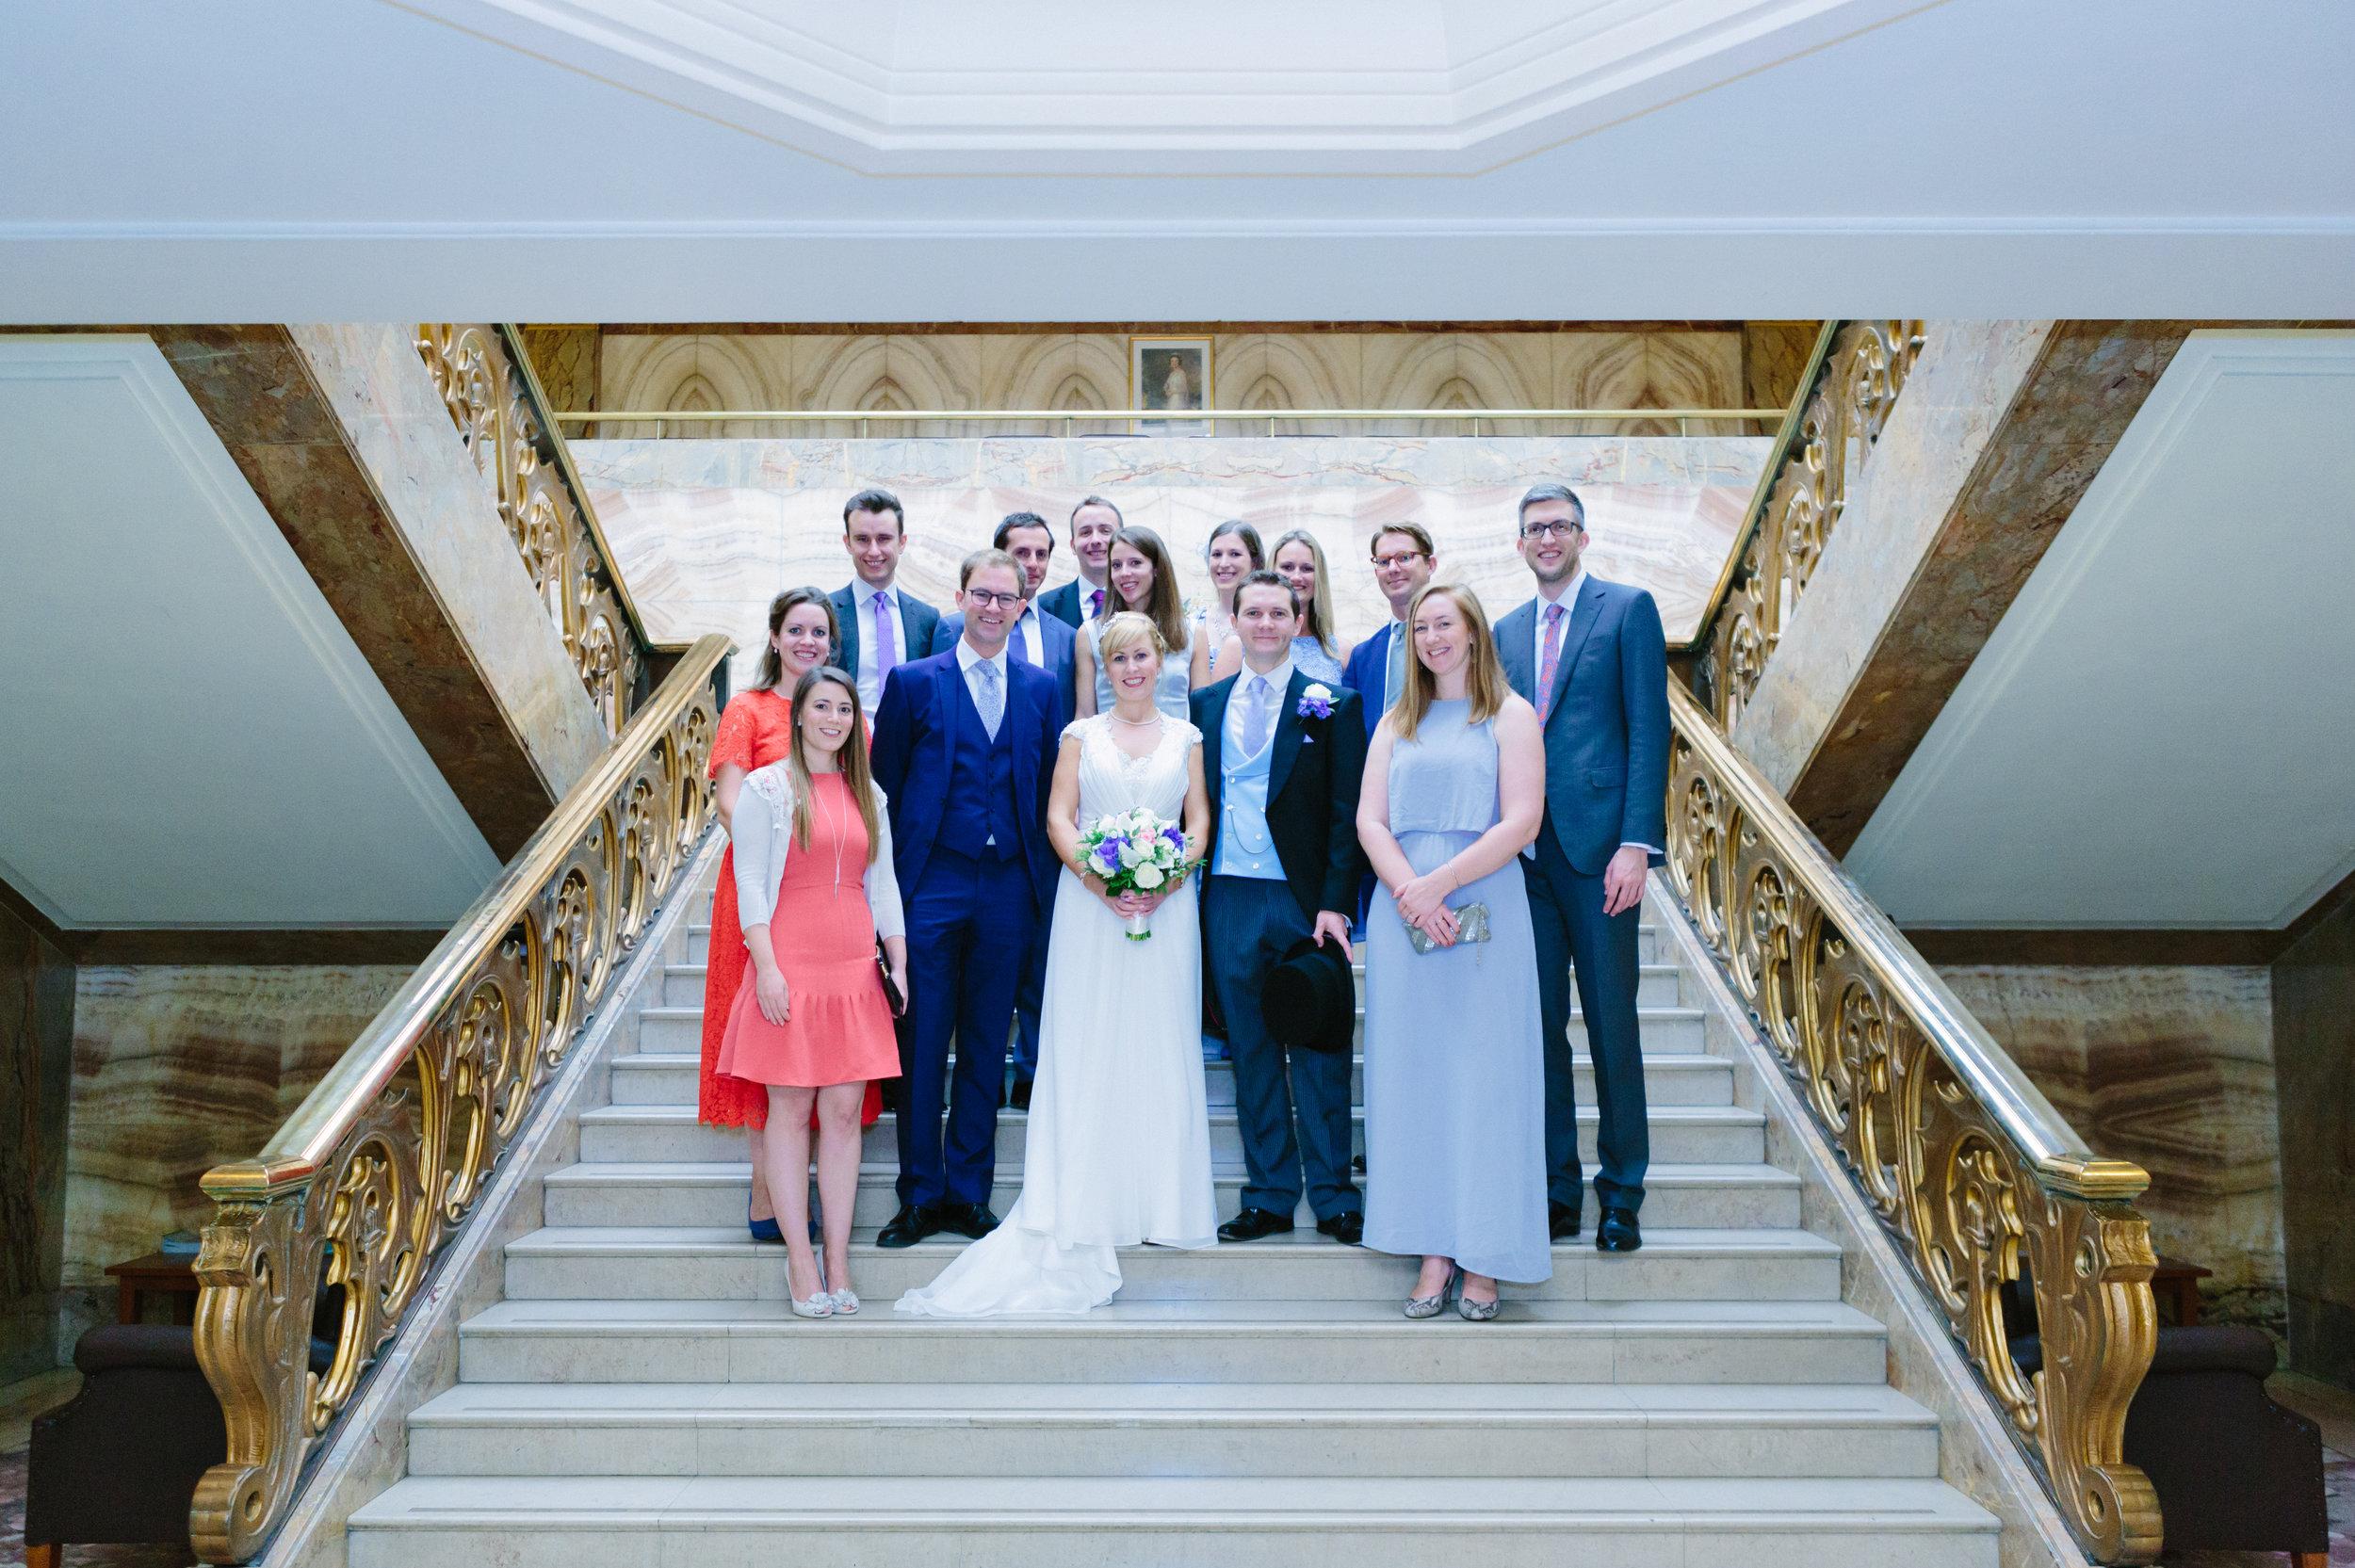 london-wedding-photography-wimbledon-wandsworth-town-hall-savoy-hotel-group-portrait-42